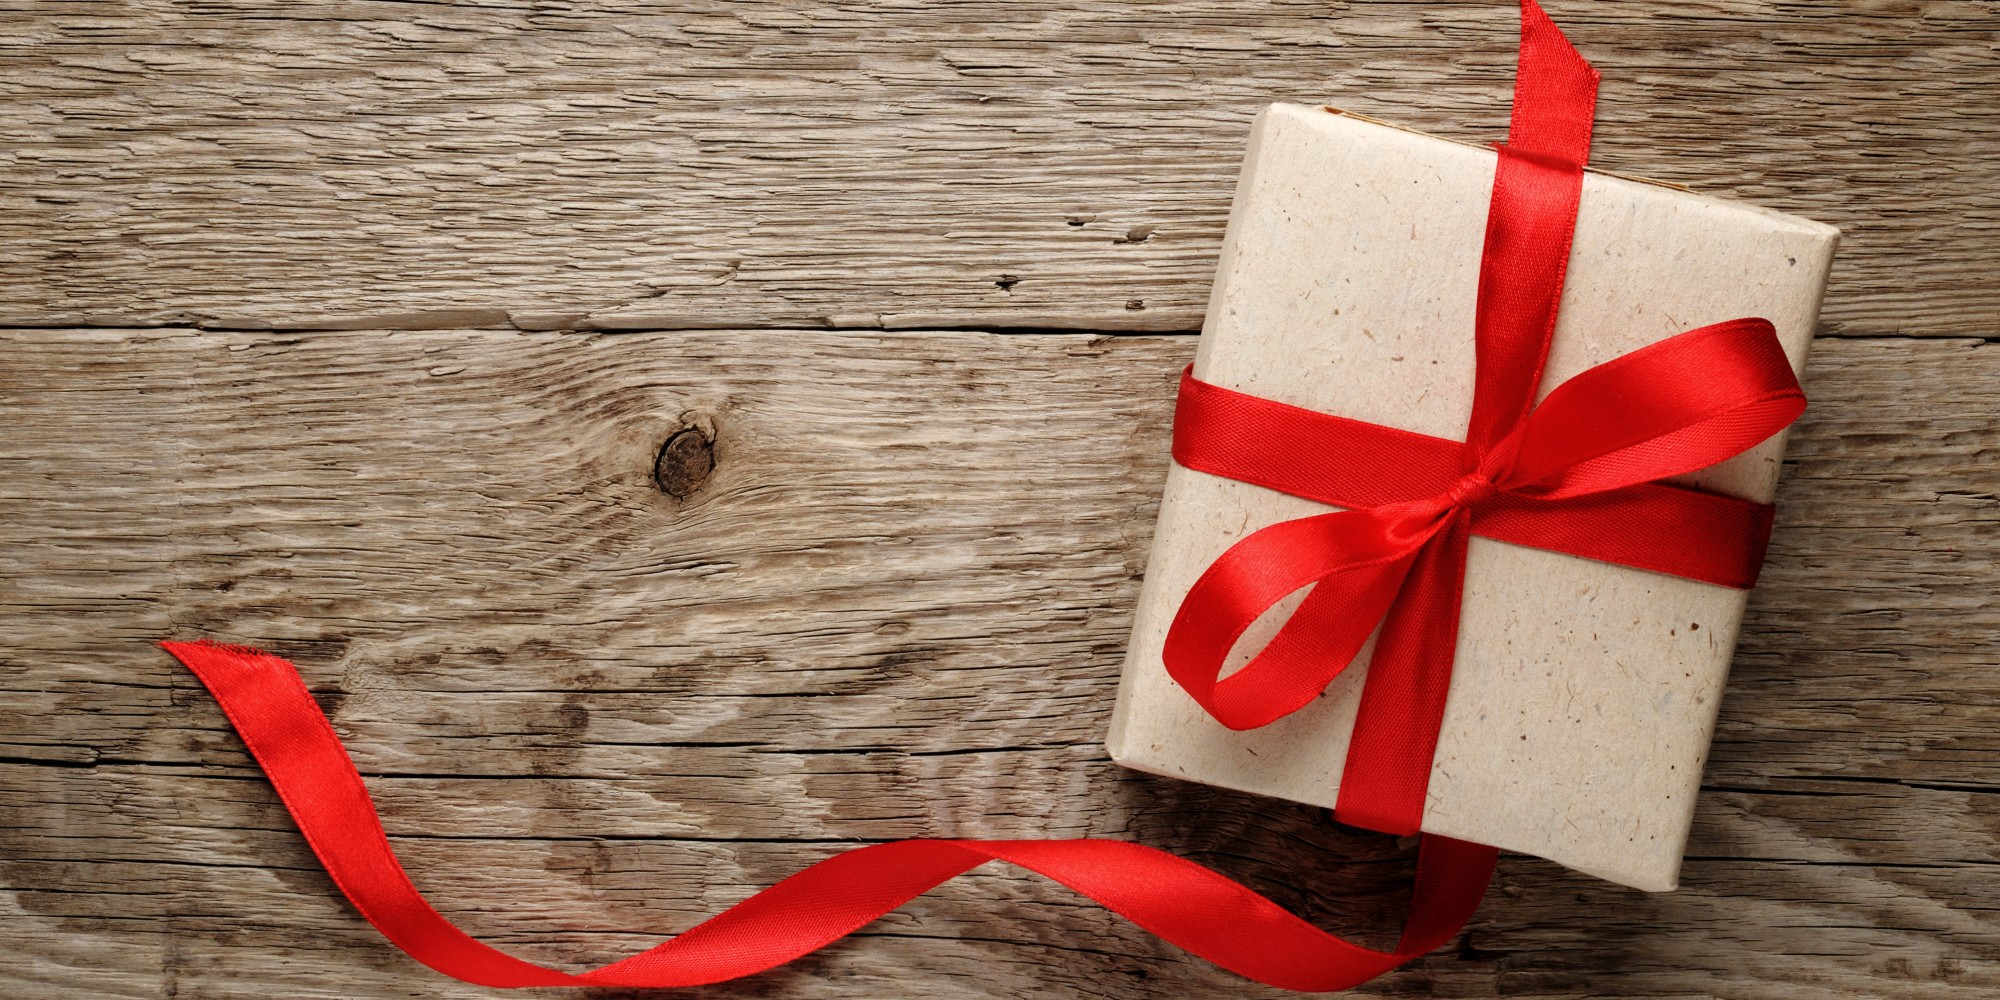 Emballage cadeau simple et facile.